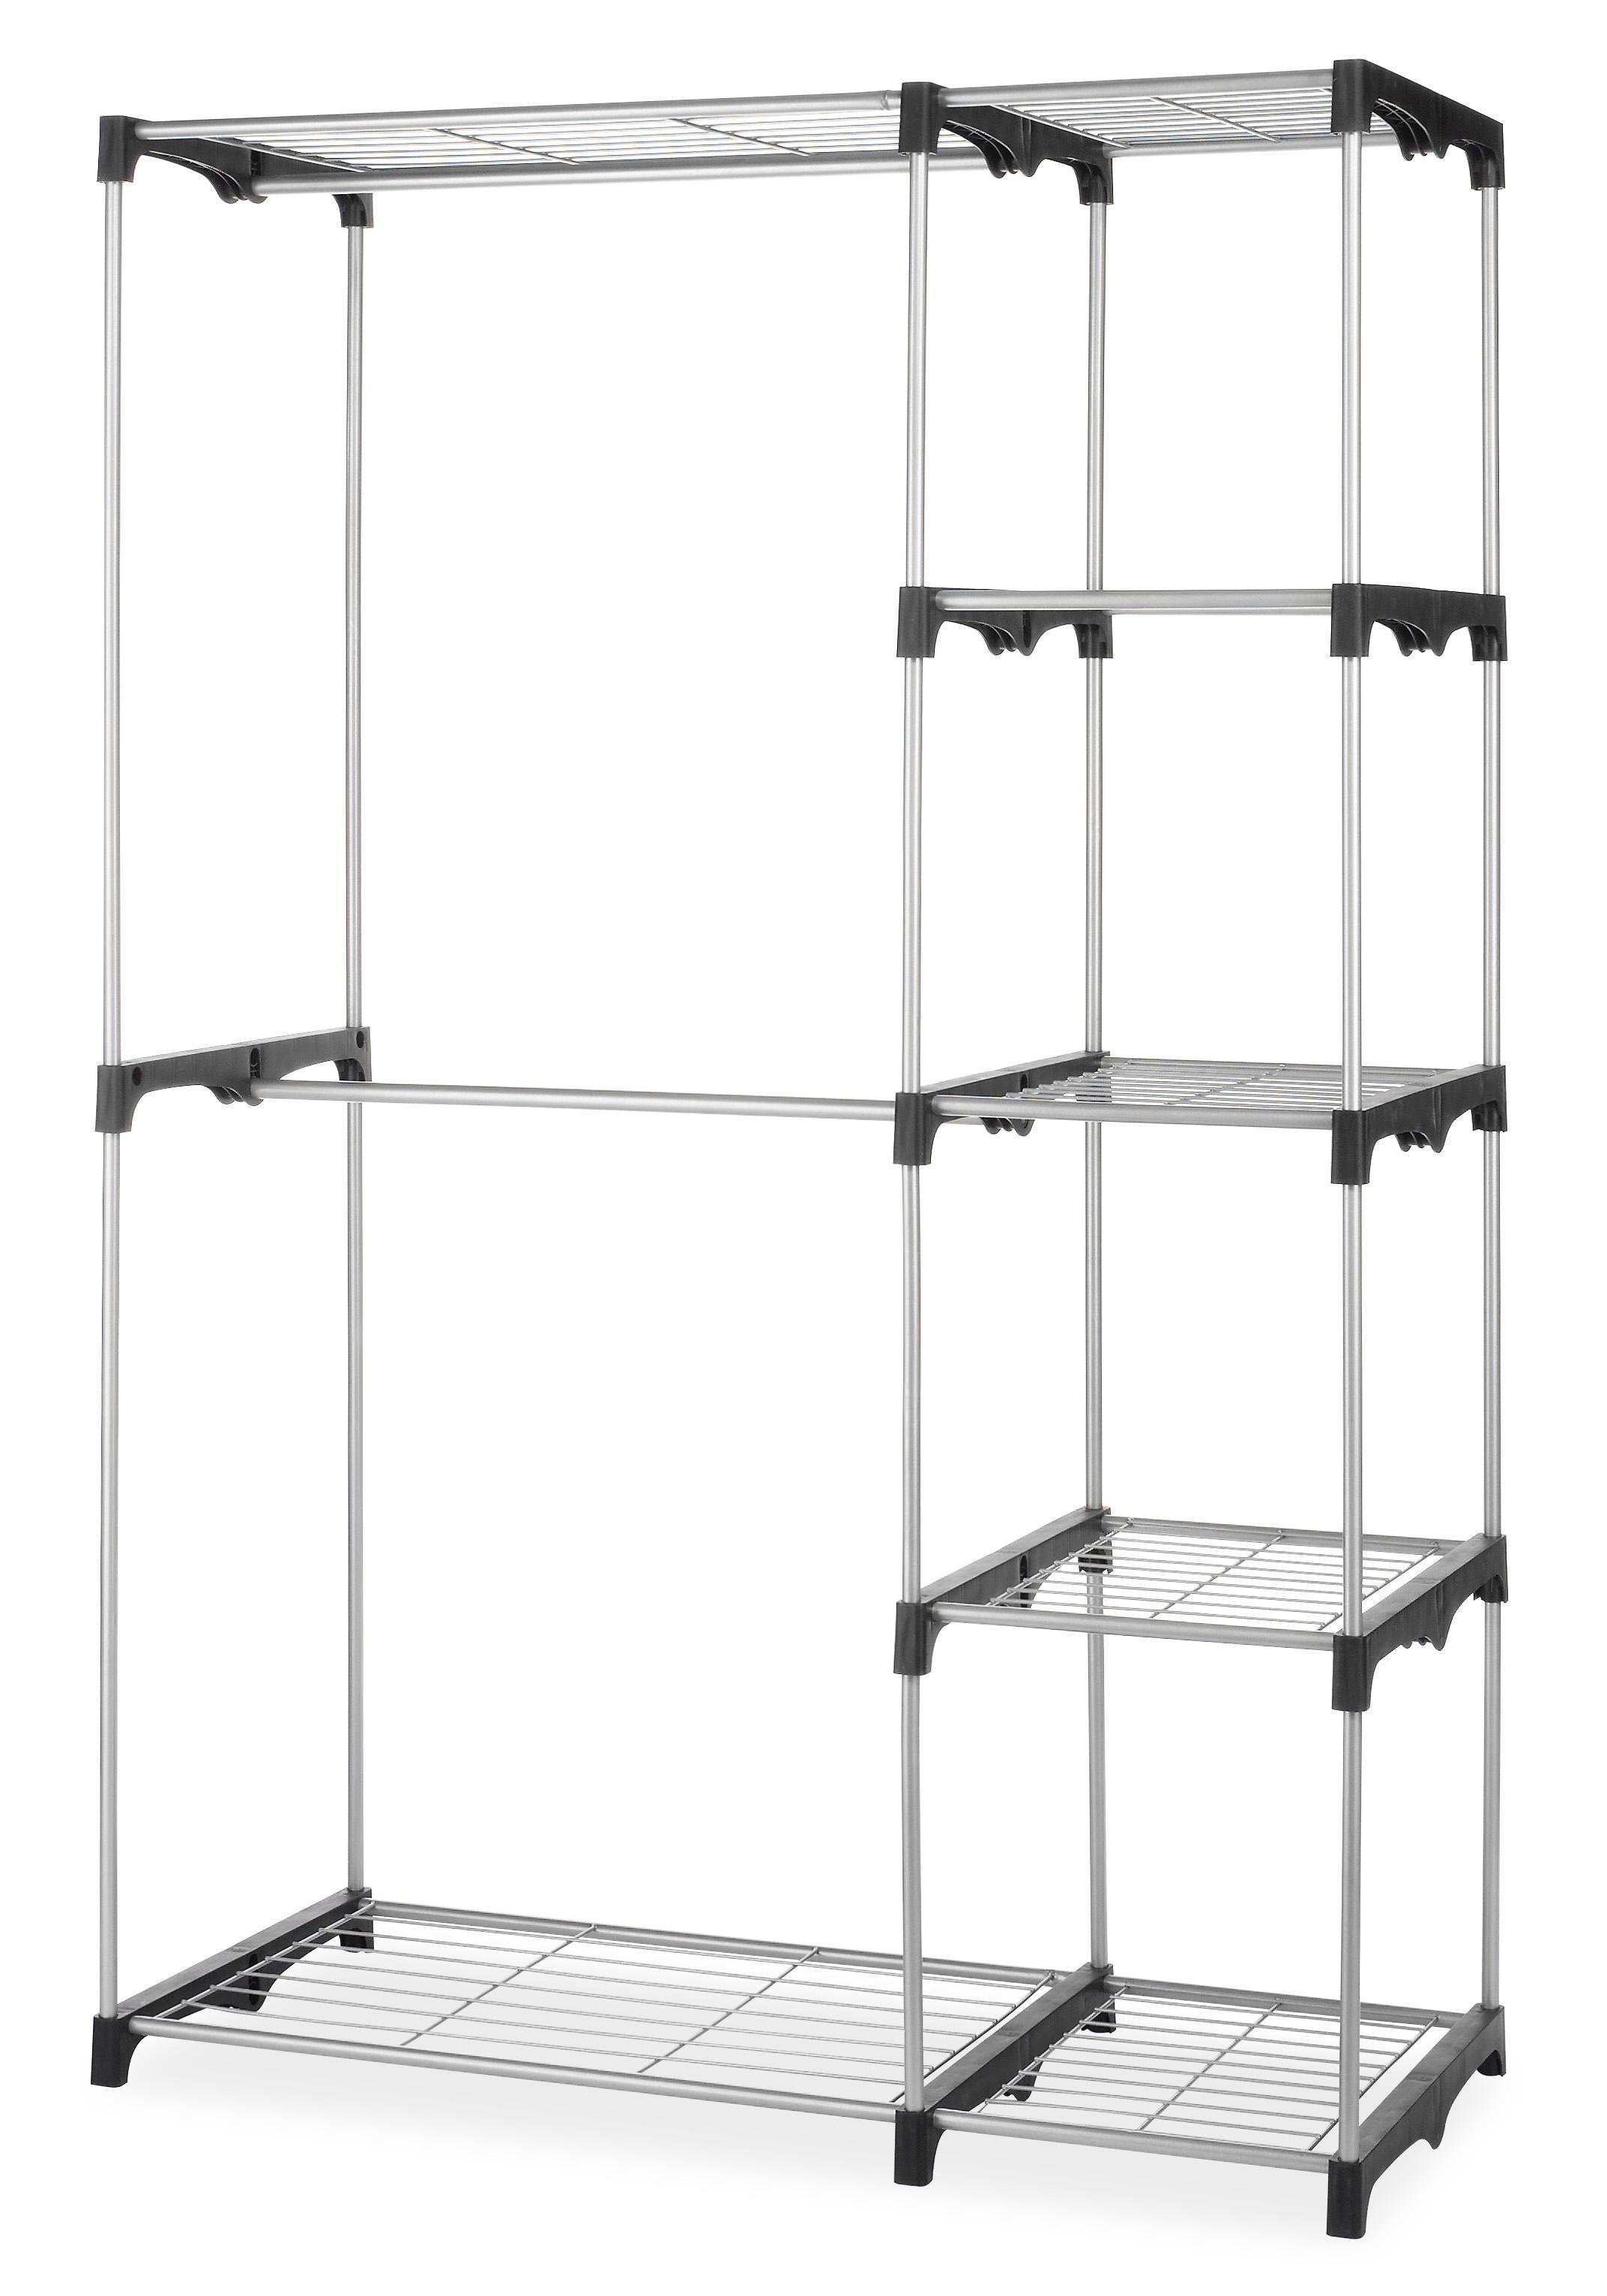 Double Rod Closet : Amazon whitmor double rod freestanding closet silver